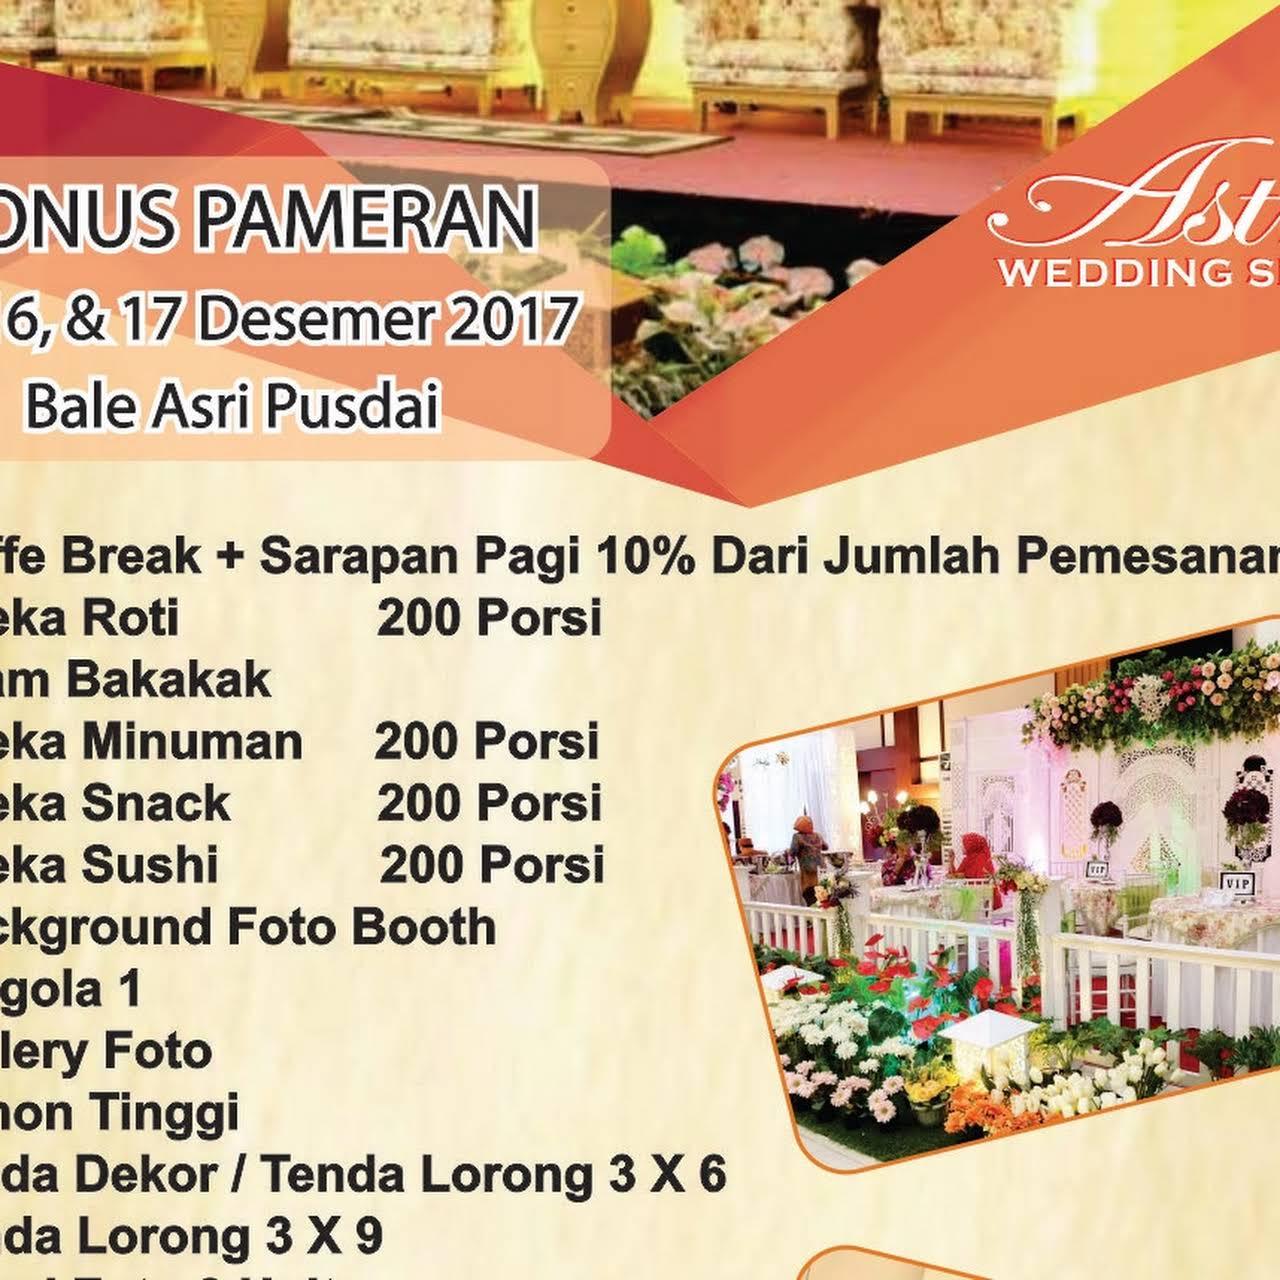 Catering Wedding Bandung 6